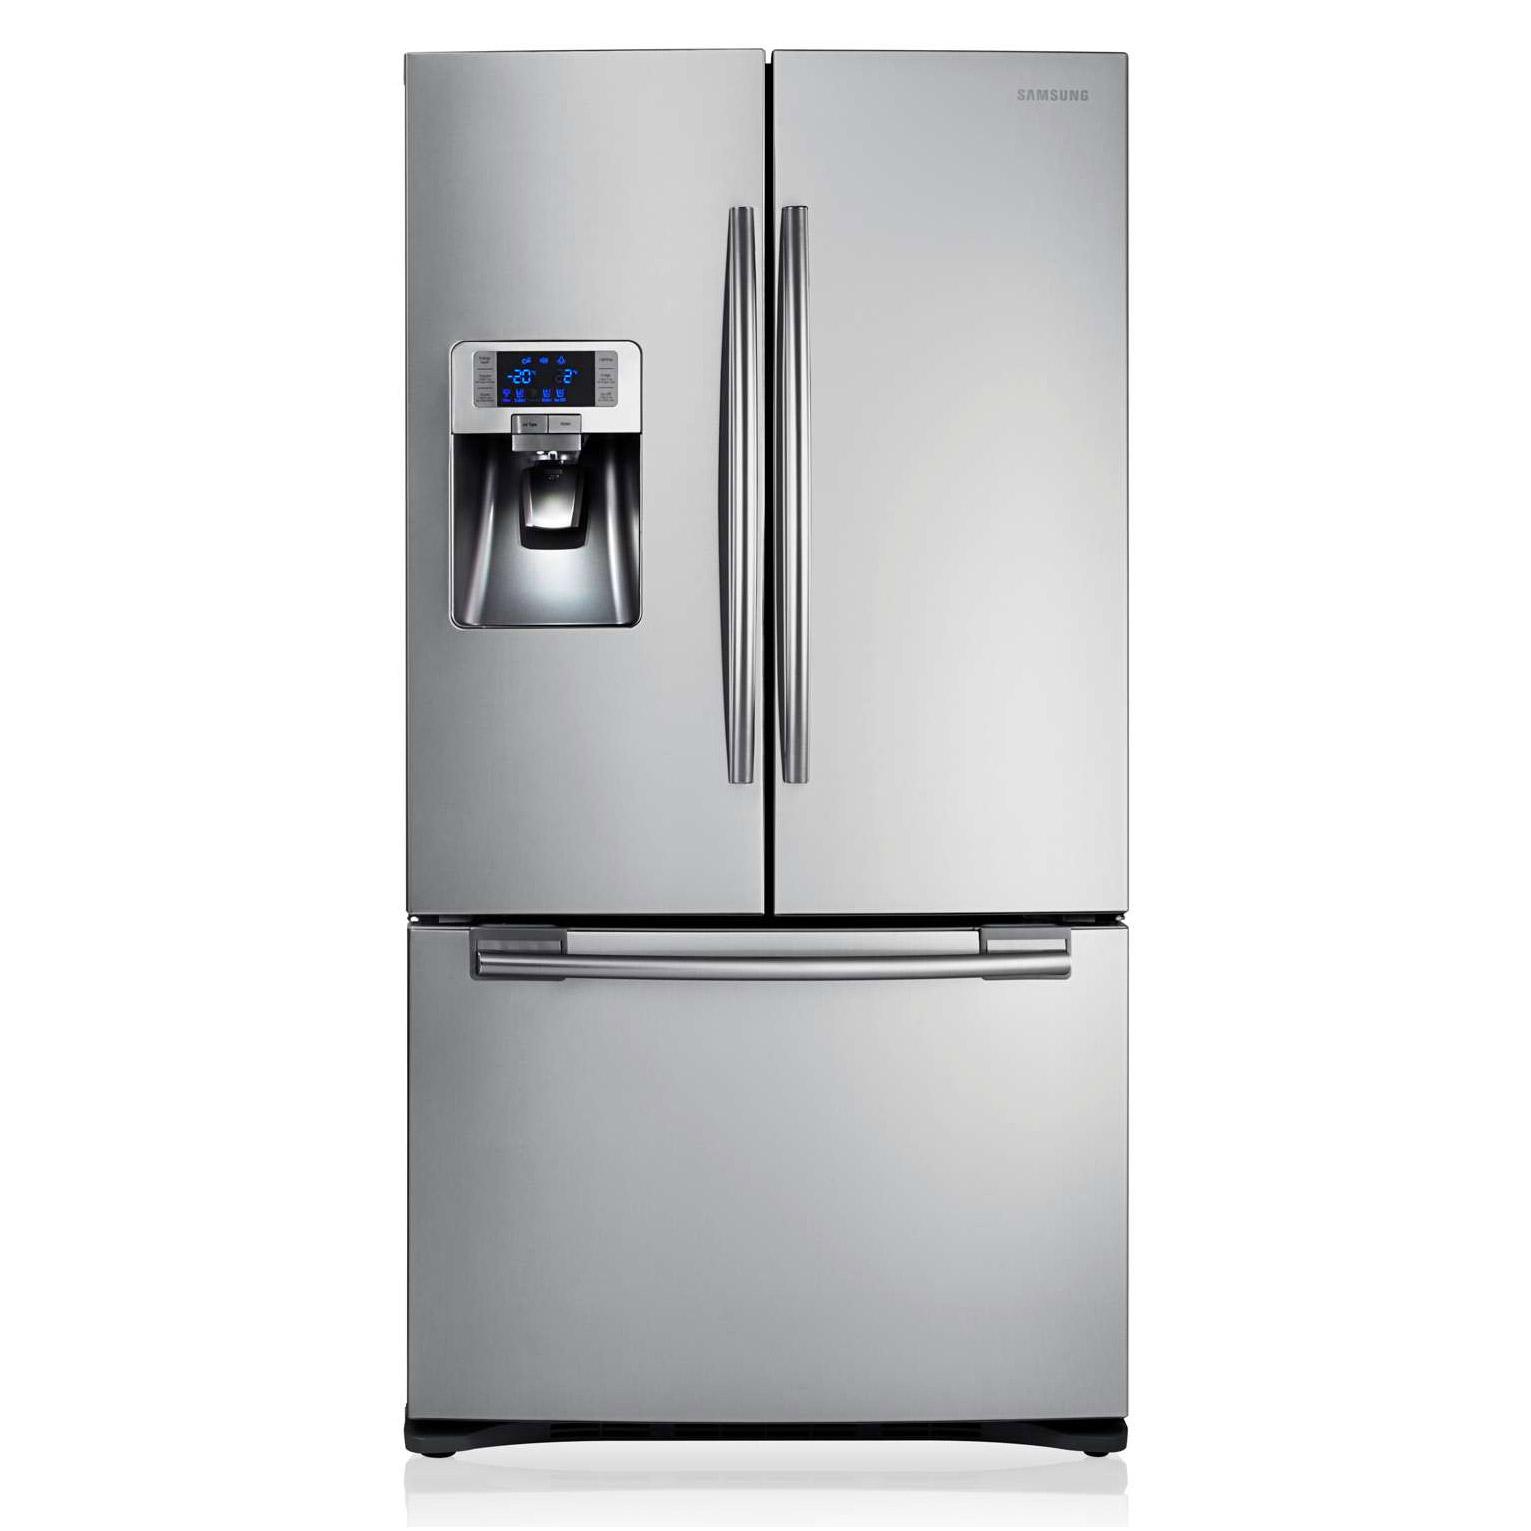 649bd71c9770 Samsung RFG23UERS French Style Fridge Freezer in St/Steel, I&W 1.8m A+